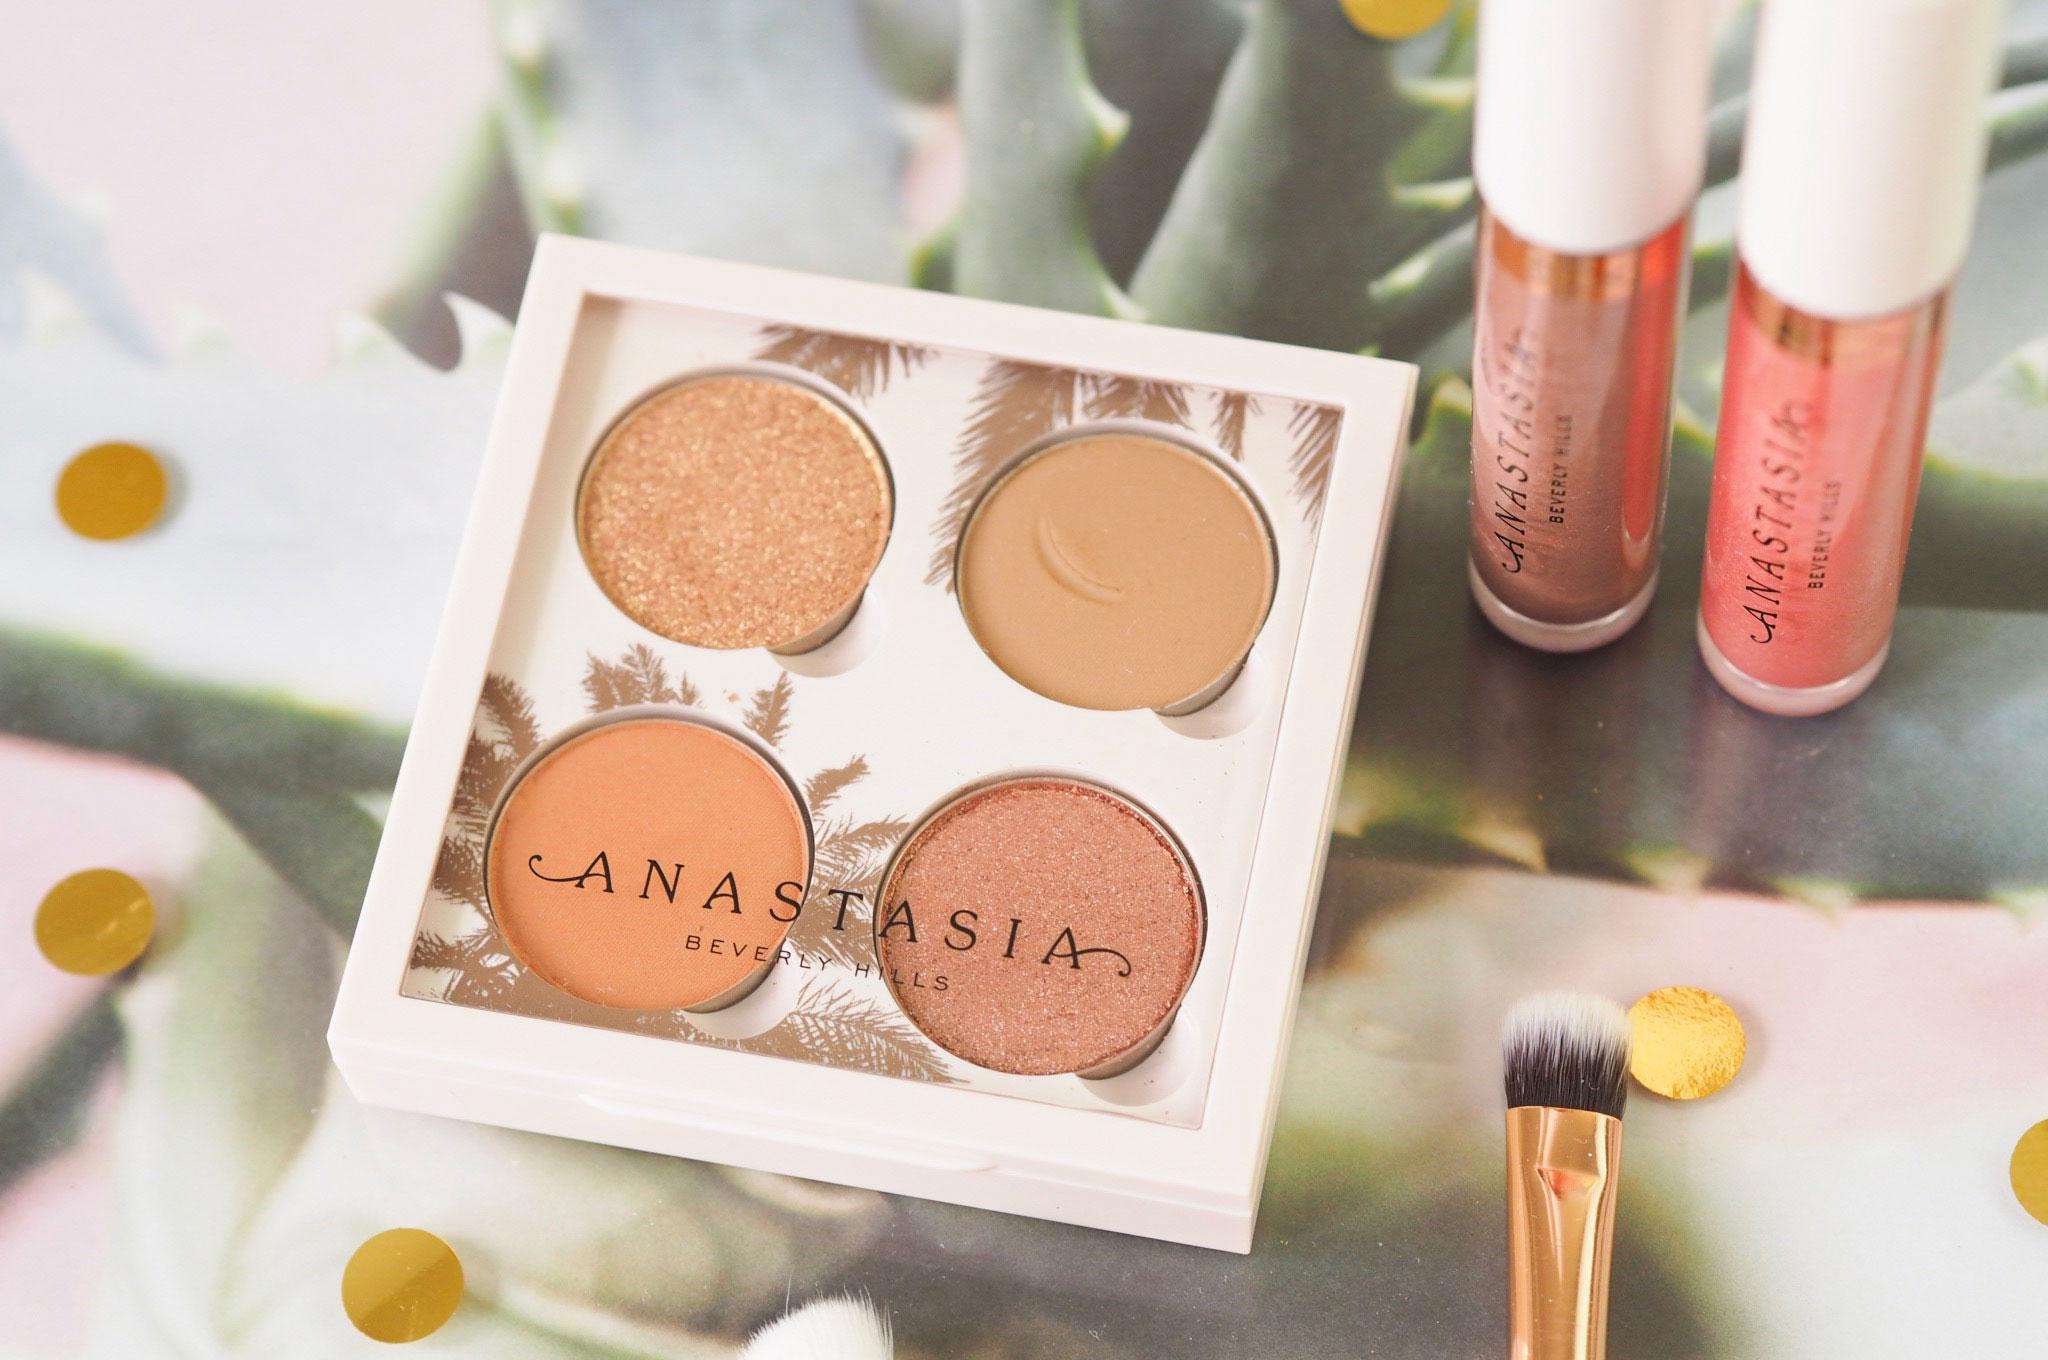 Anastasia Beverly Hills Daytime Collection Eyeshadow Swatches